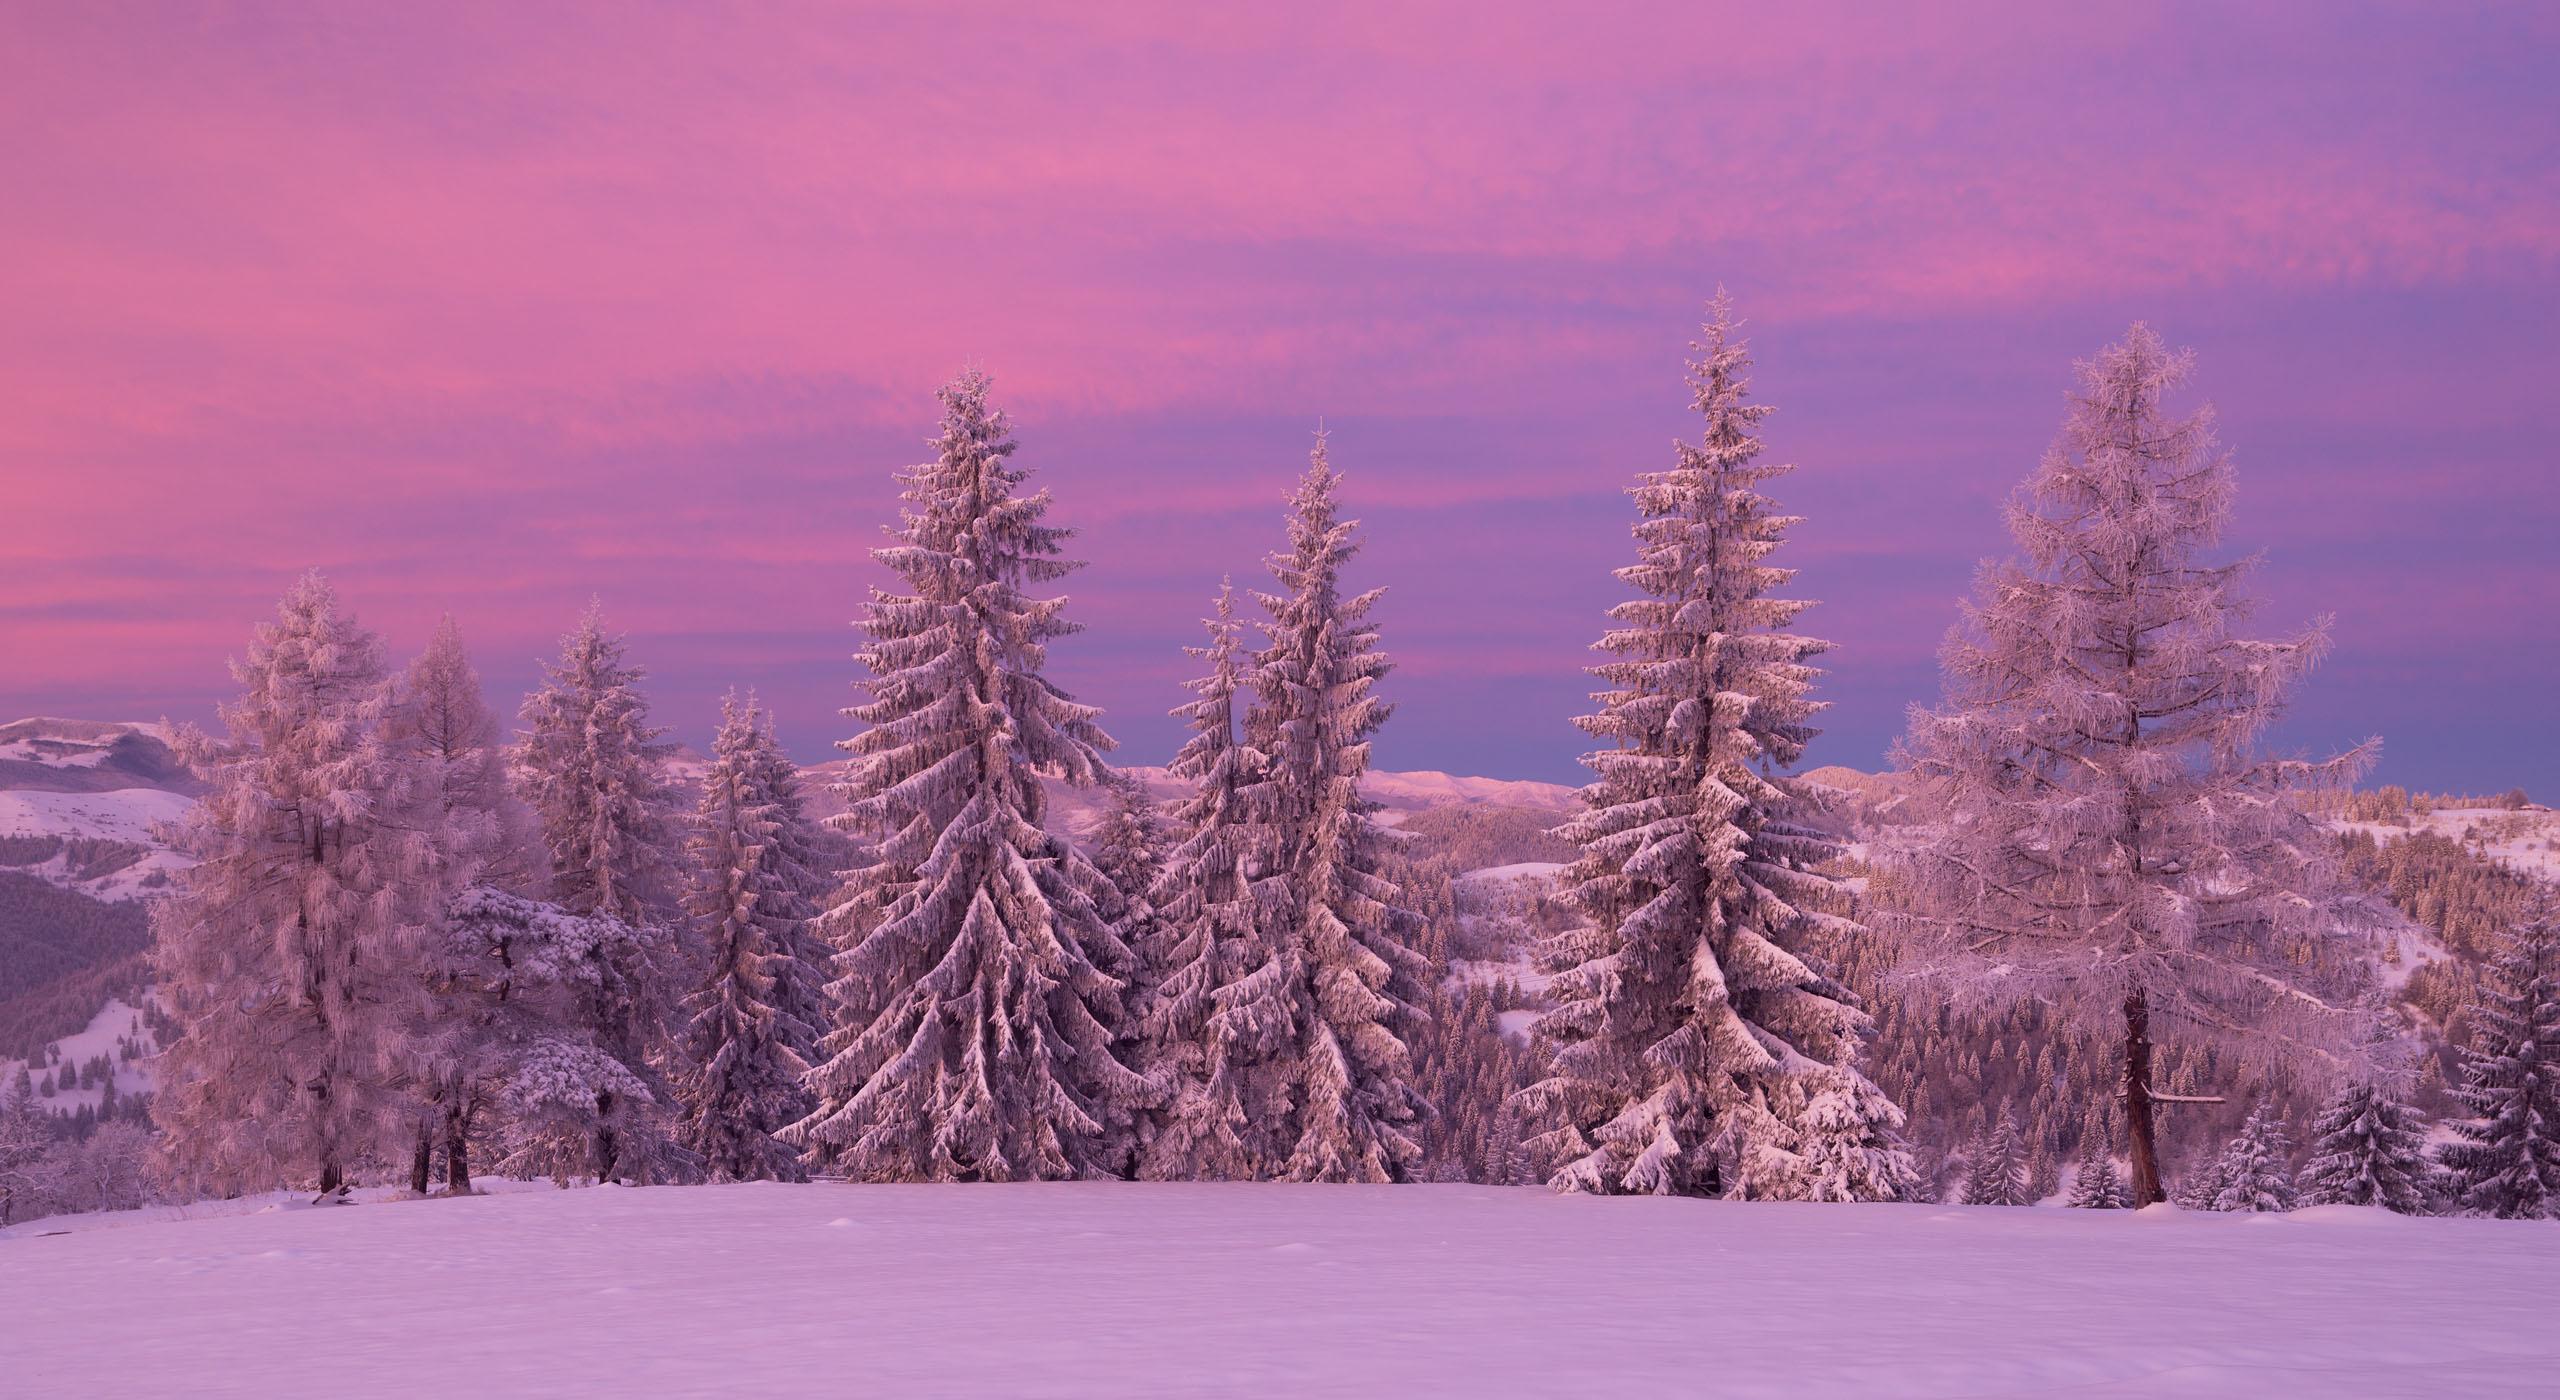 Winter in Pokytski Mountains